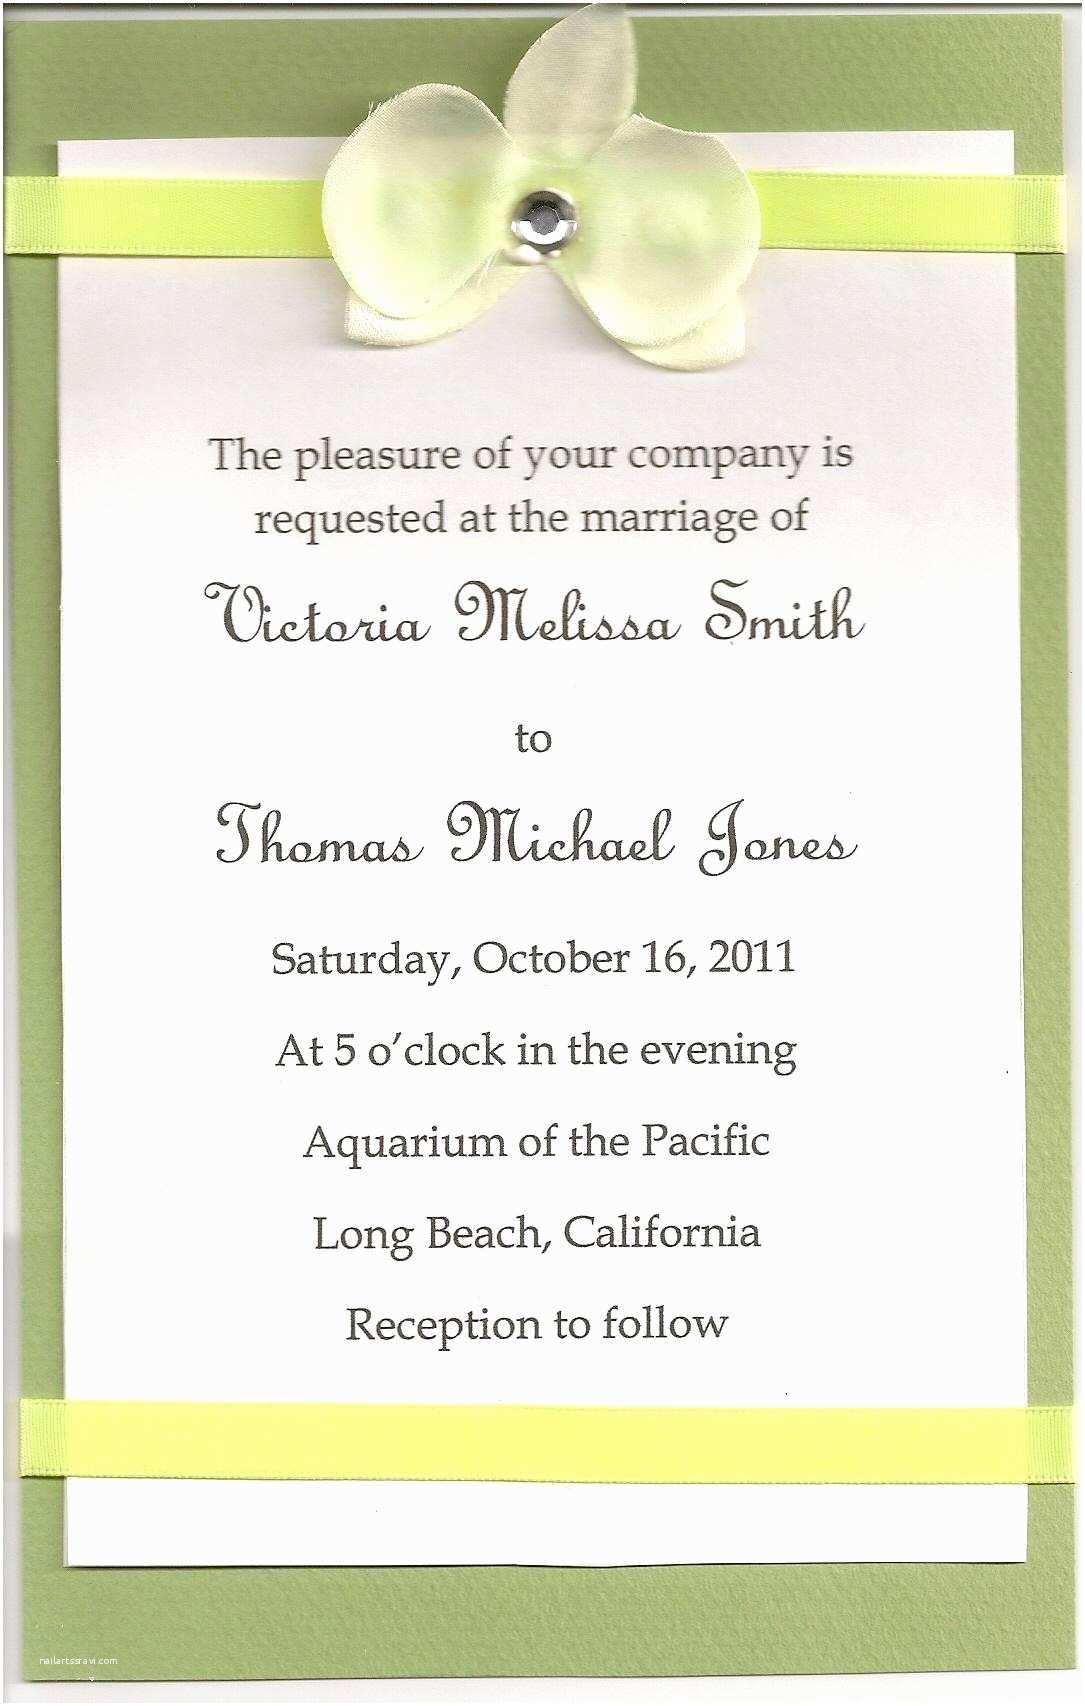 Samples Of Wedding Invitations Diy Wedding Invitations Simple Wedding Invitations Using